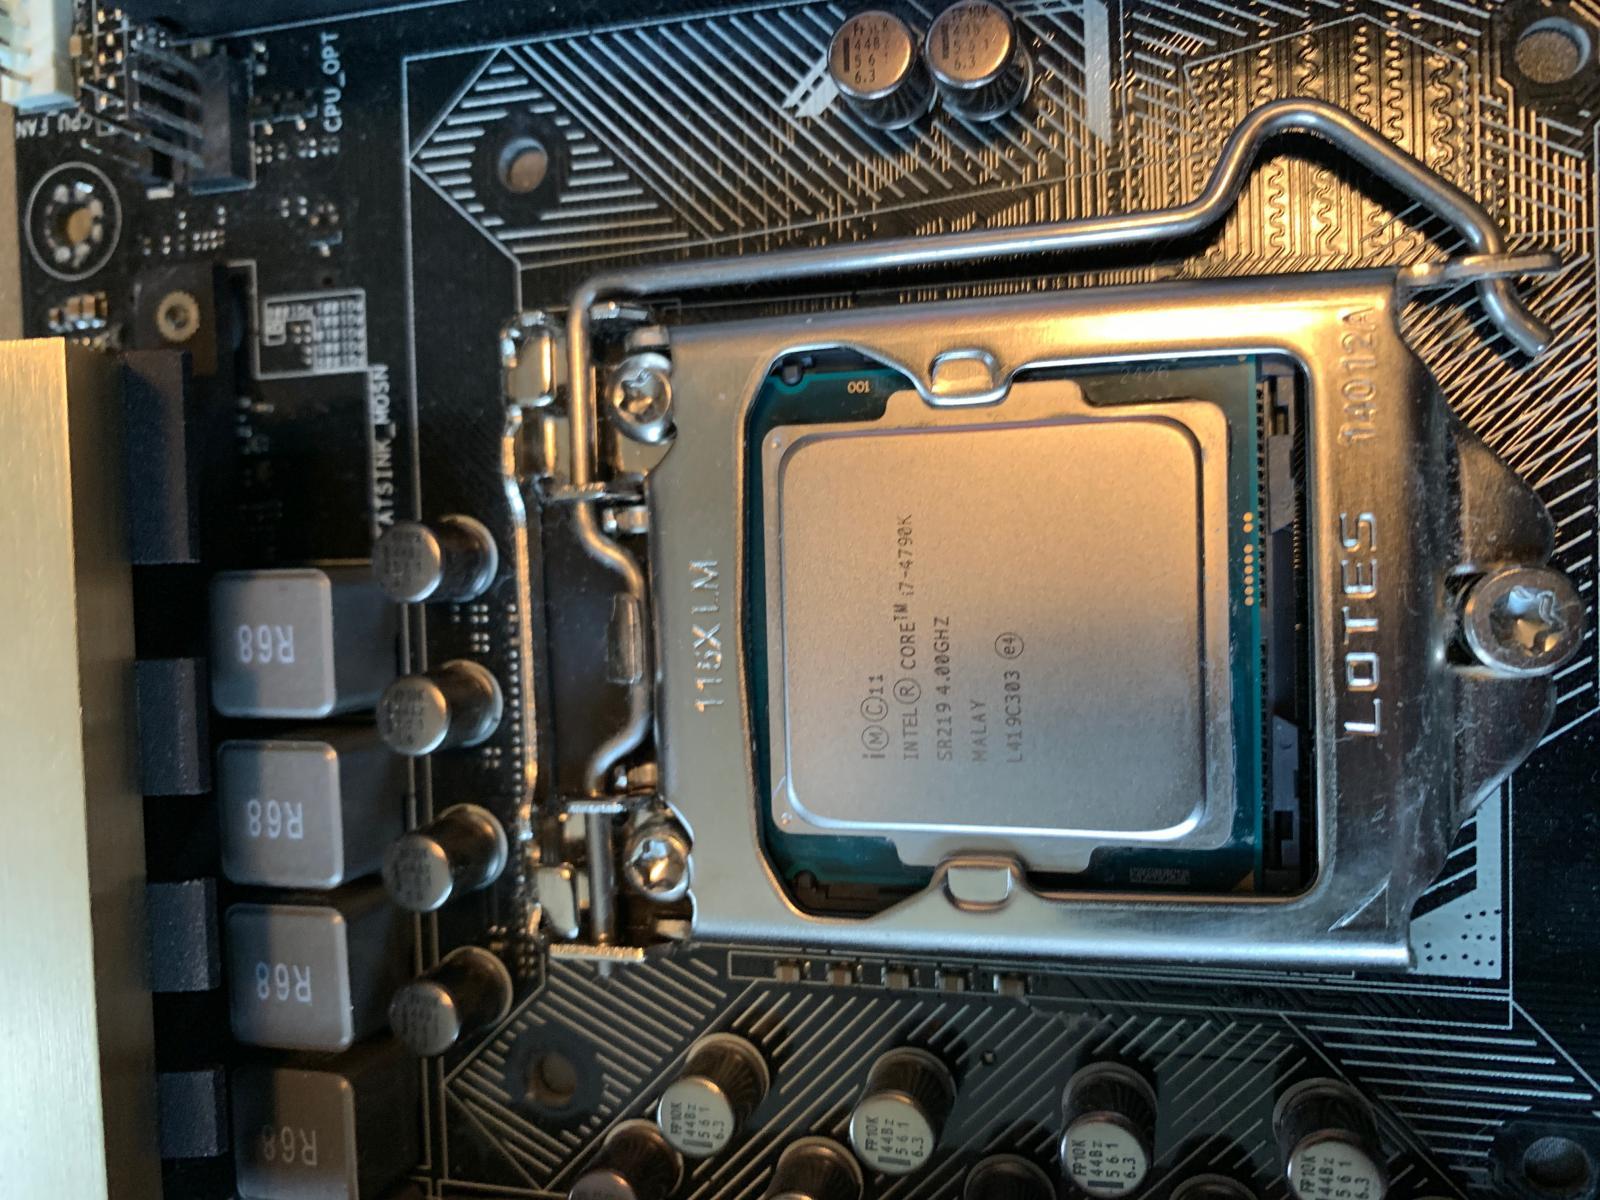 Photo of Intel i7-4790k